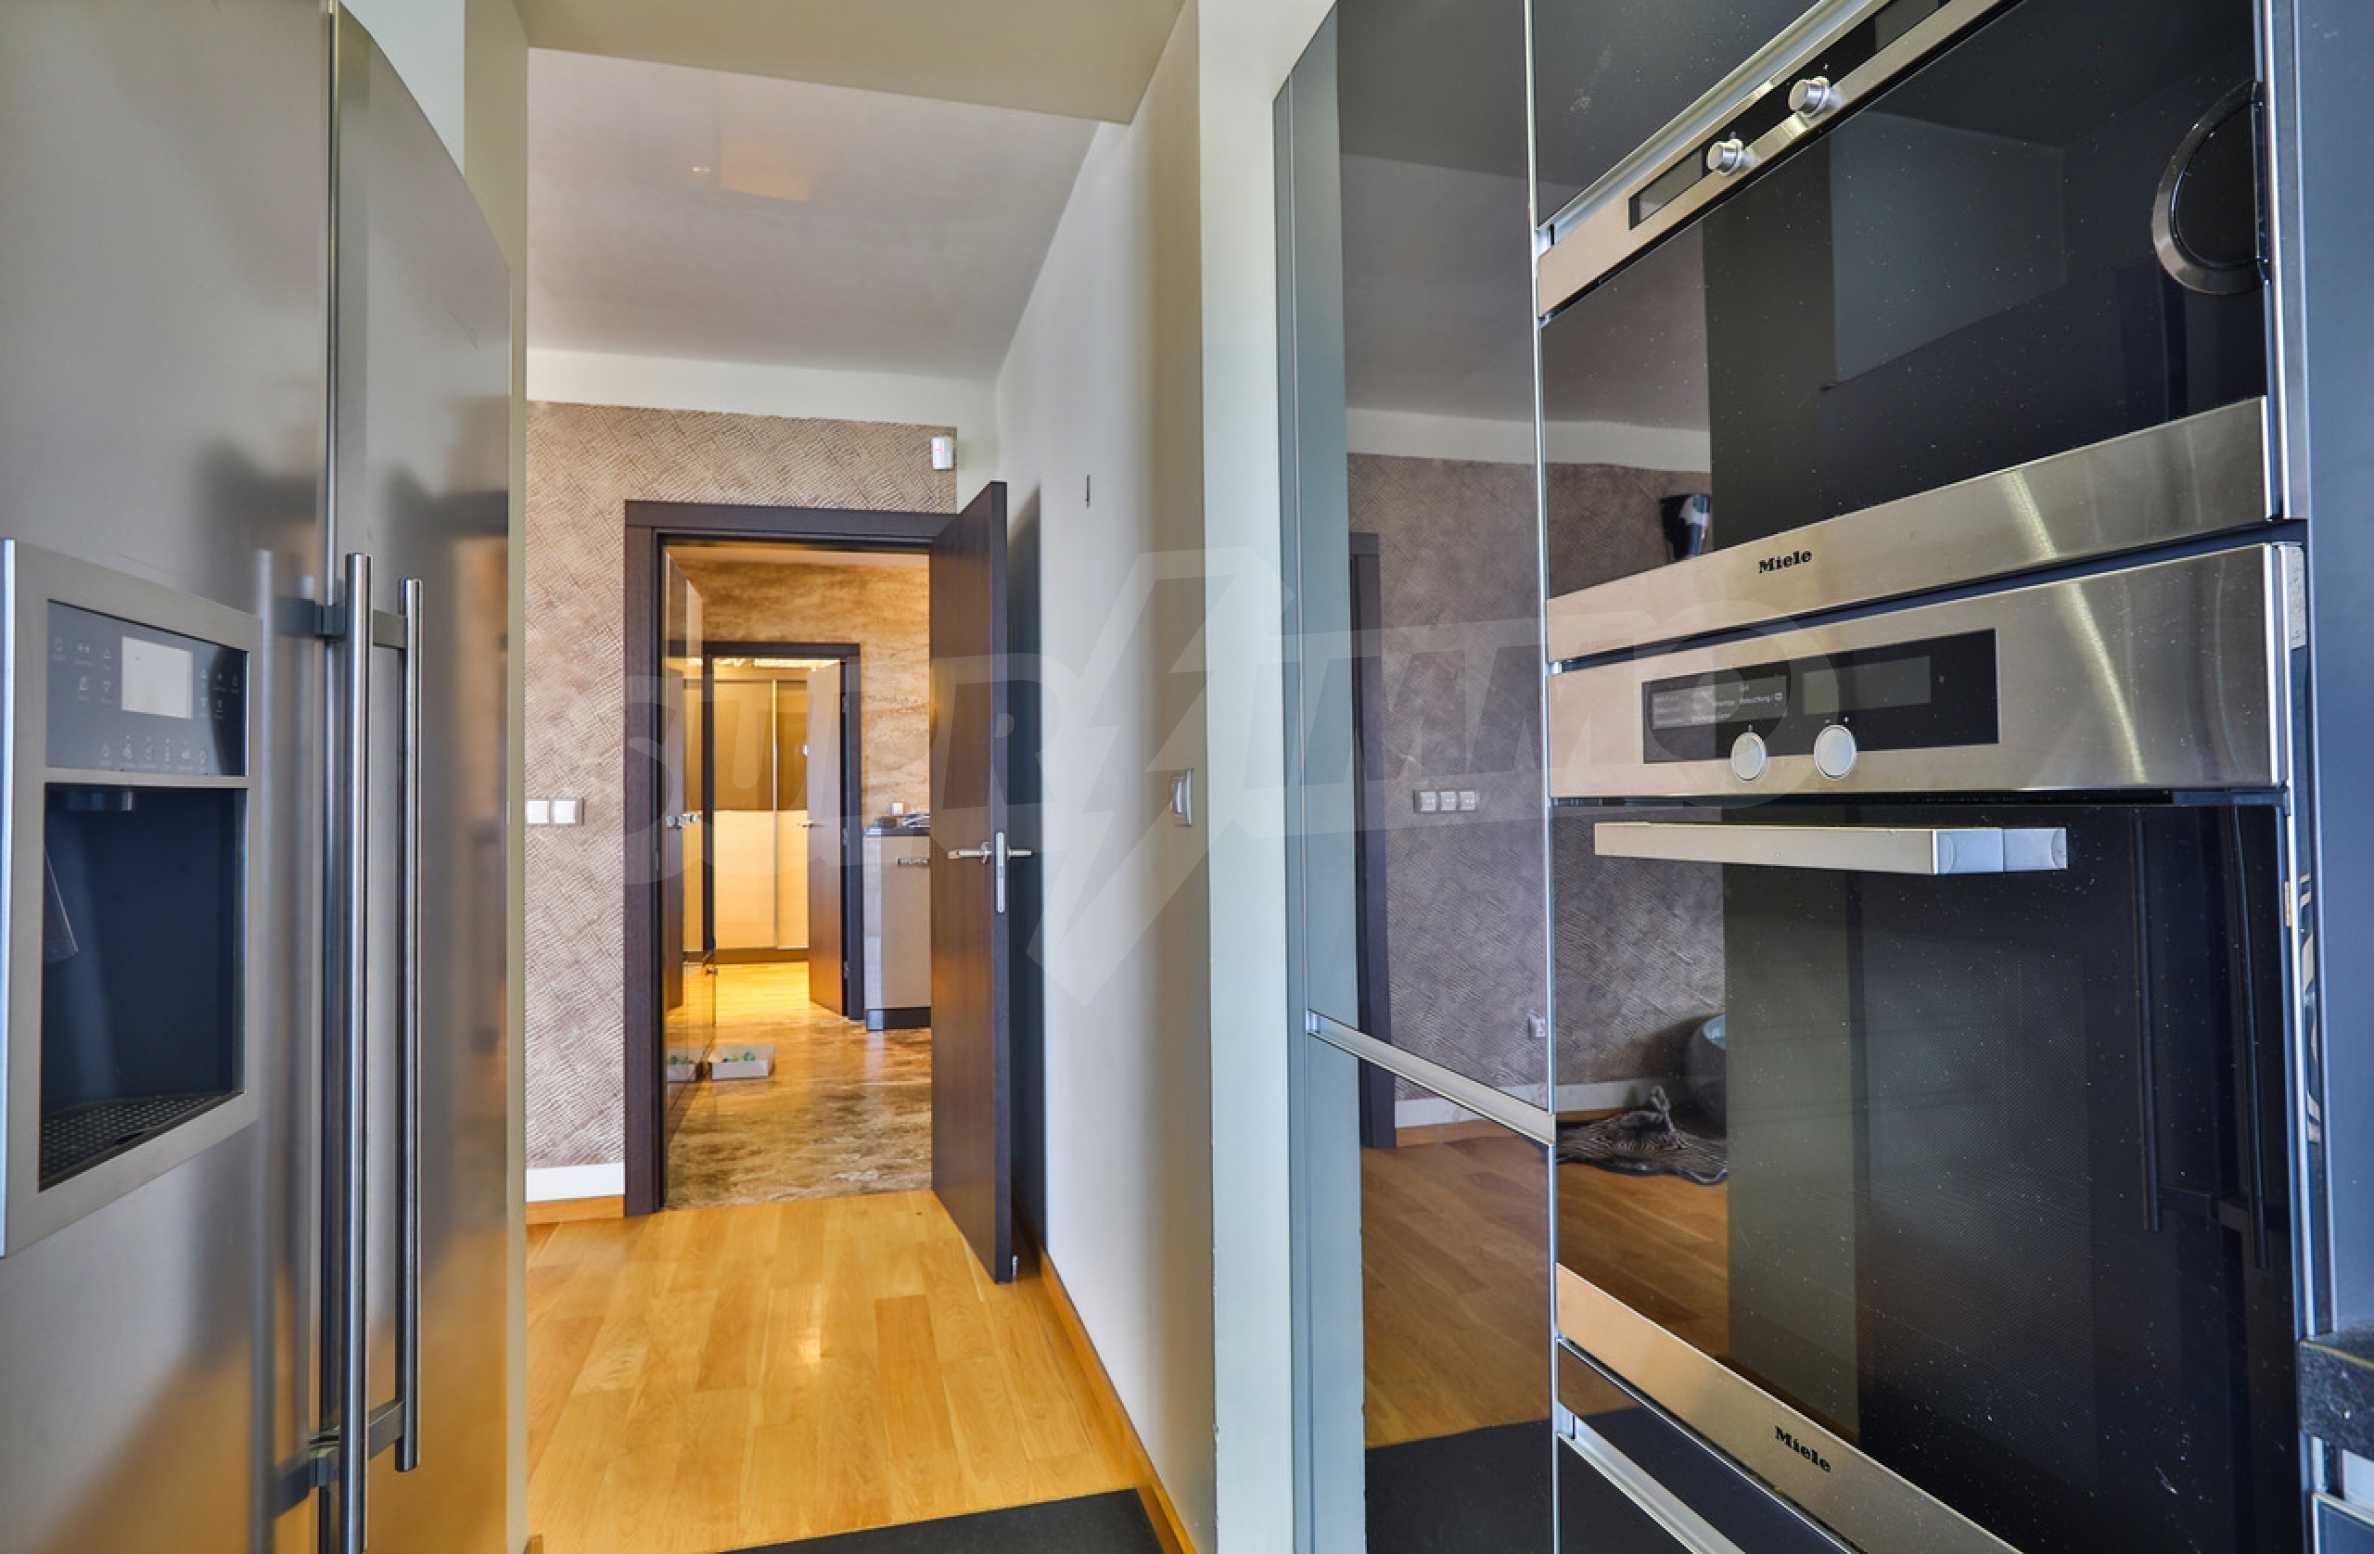 2-bedroom apartment in Sofia 6